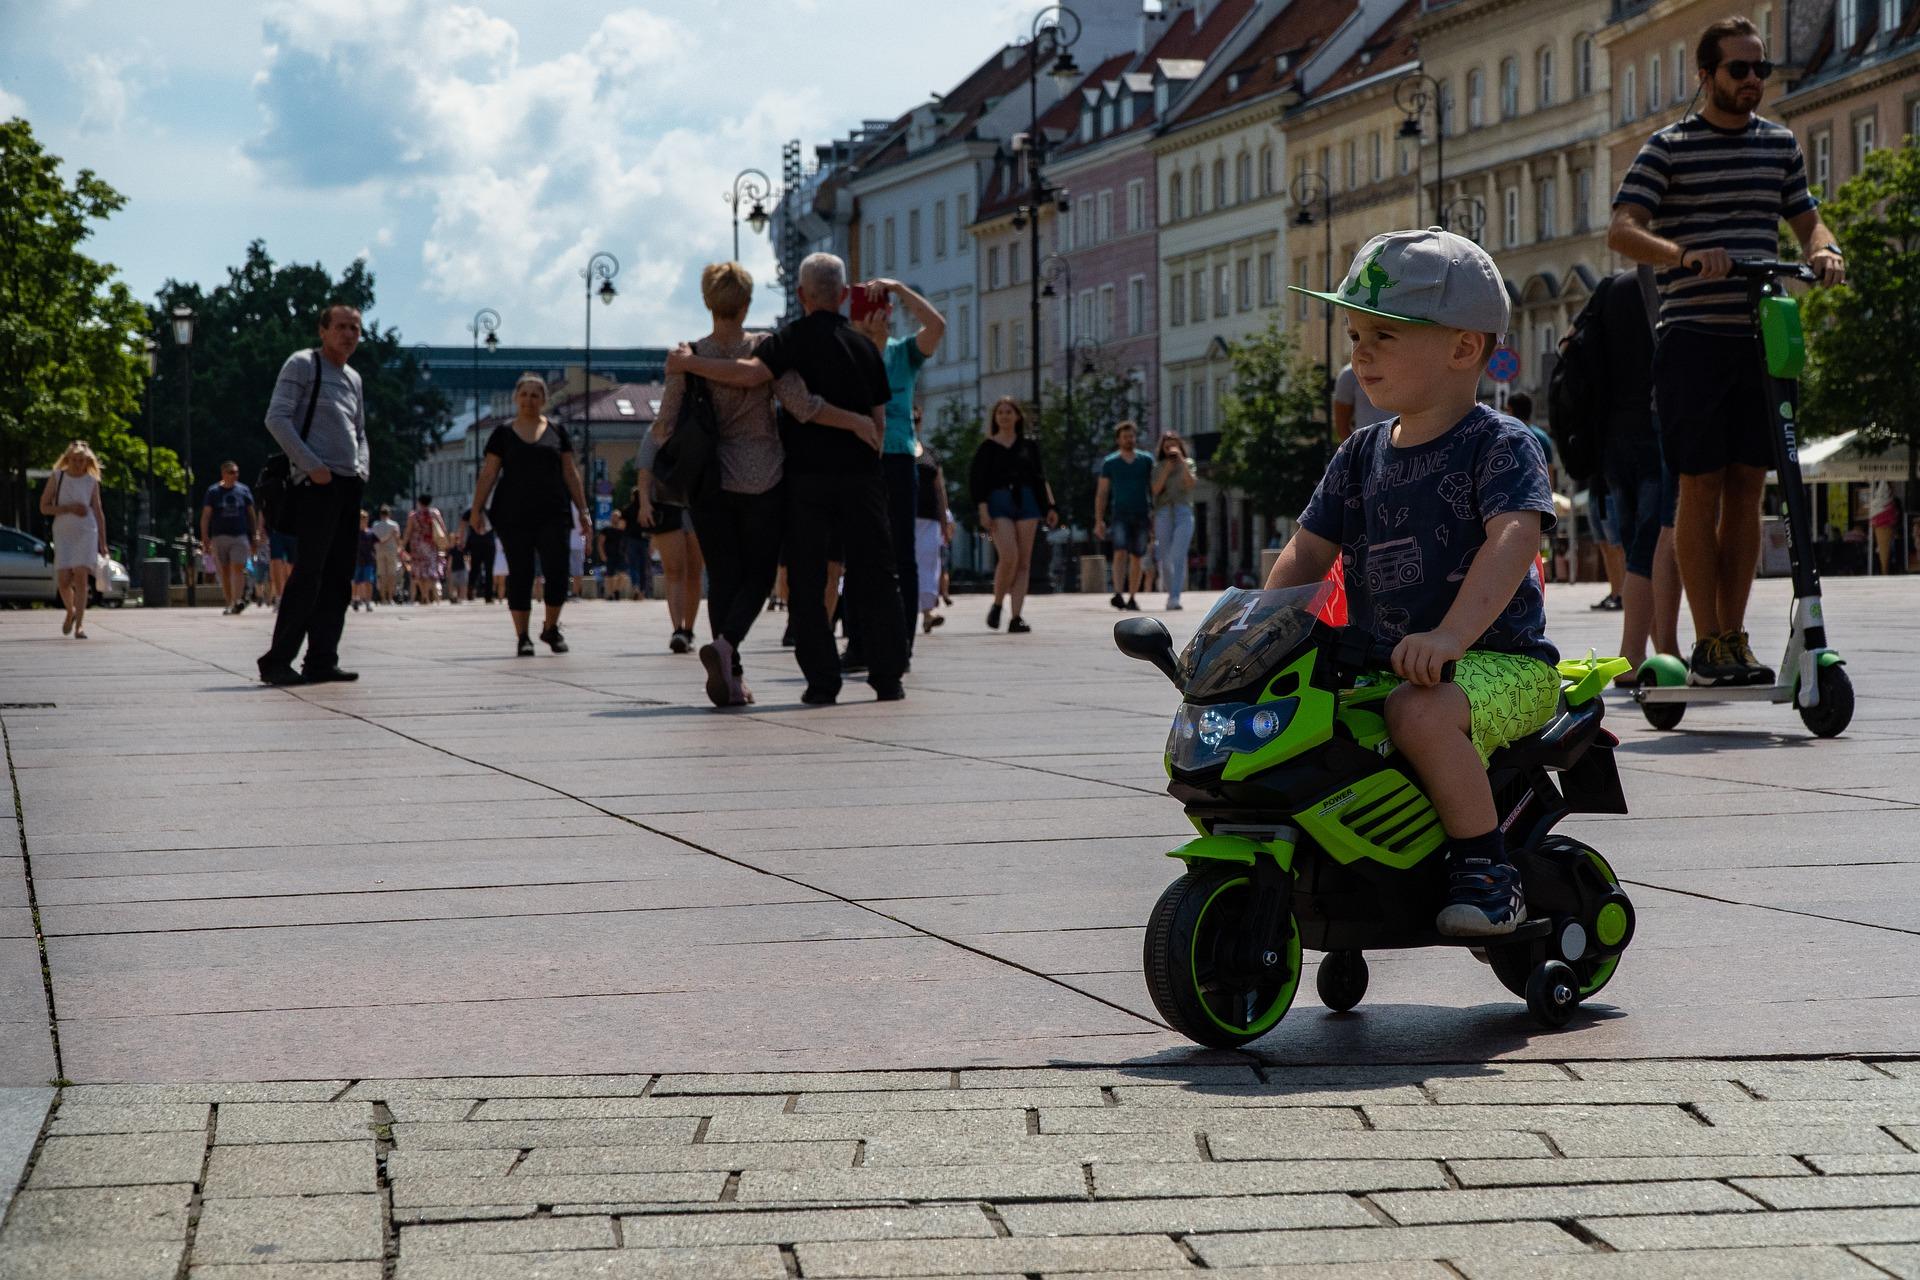 Criança sobre mini moto